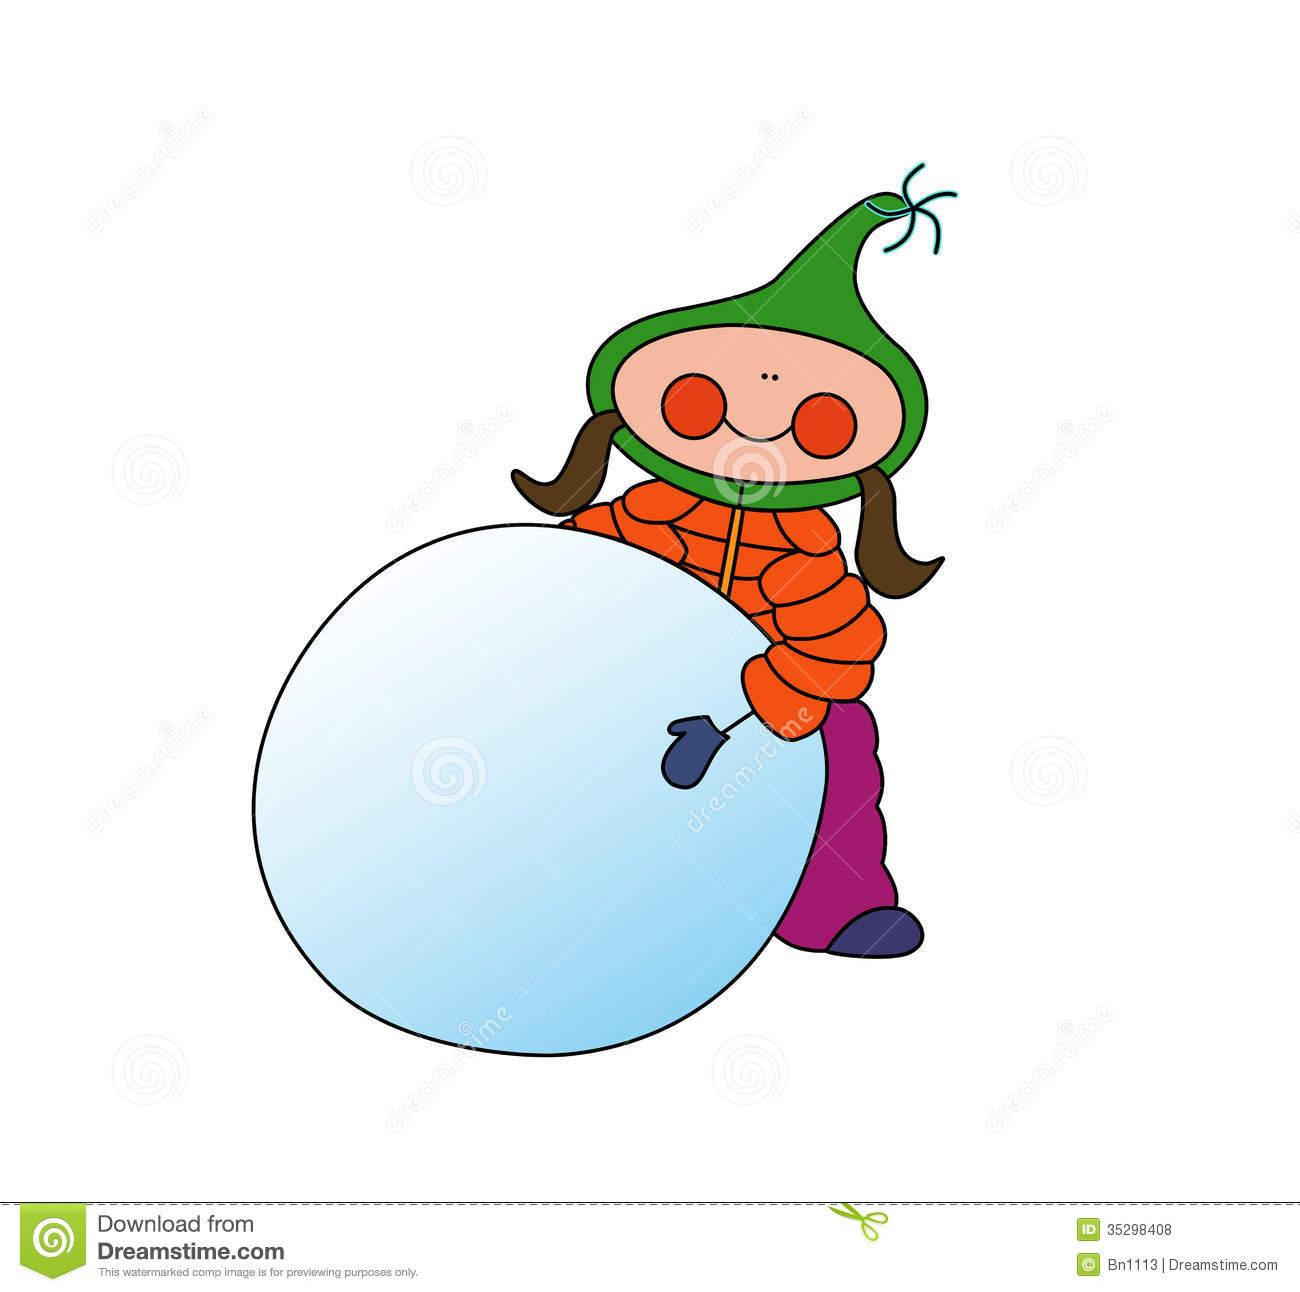 Snowball 20clipart.